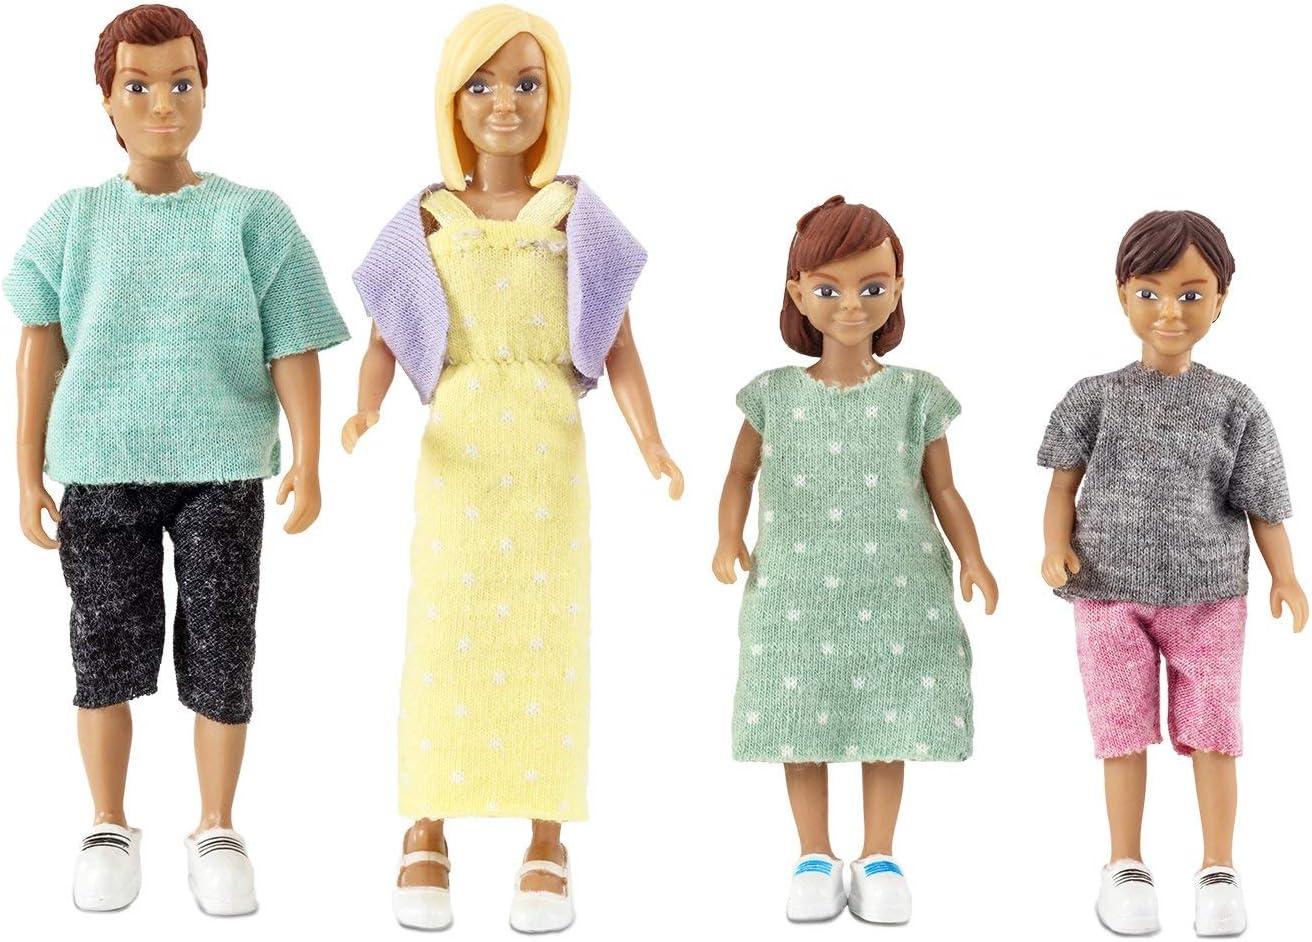 4 muñecas familia casa de muñecas Lundby padre madre 2 niños